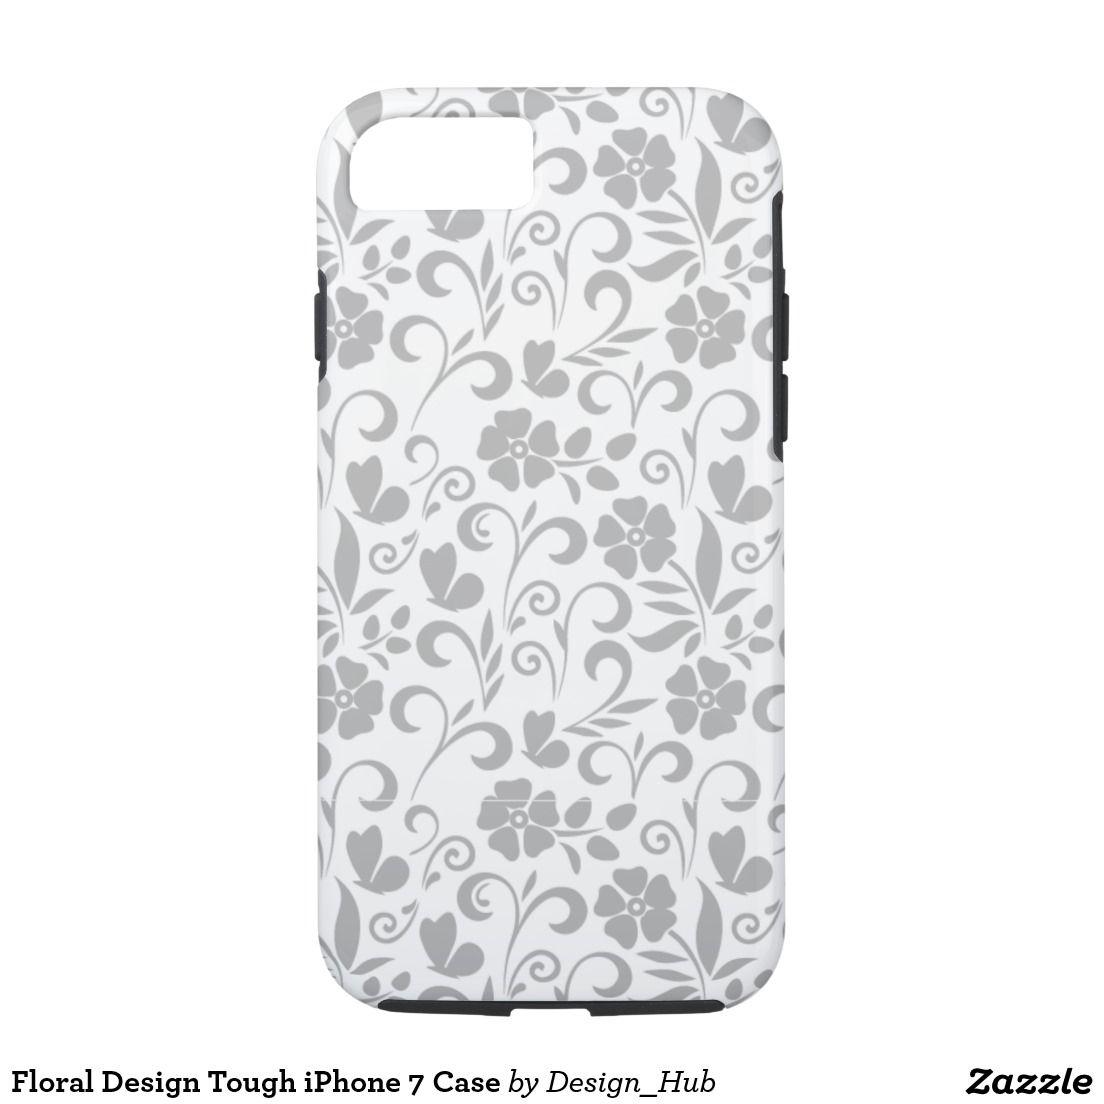 Floral Design Tough Iphone 7 Case